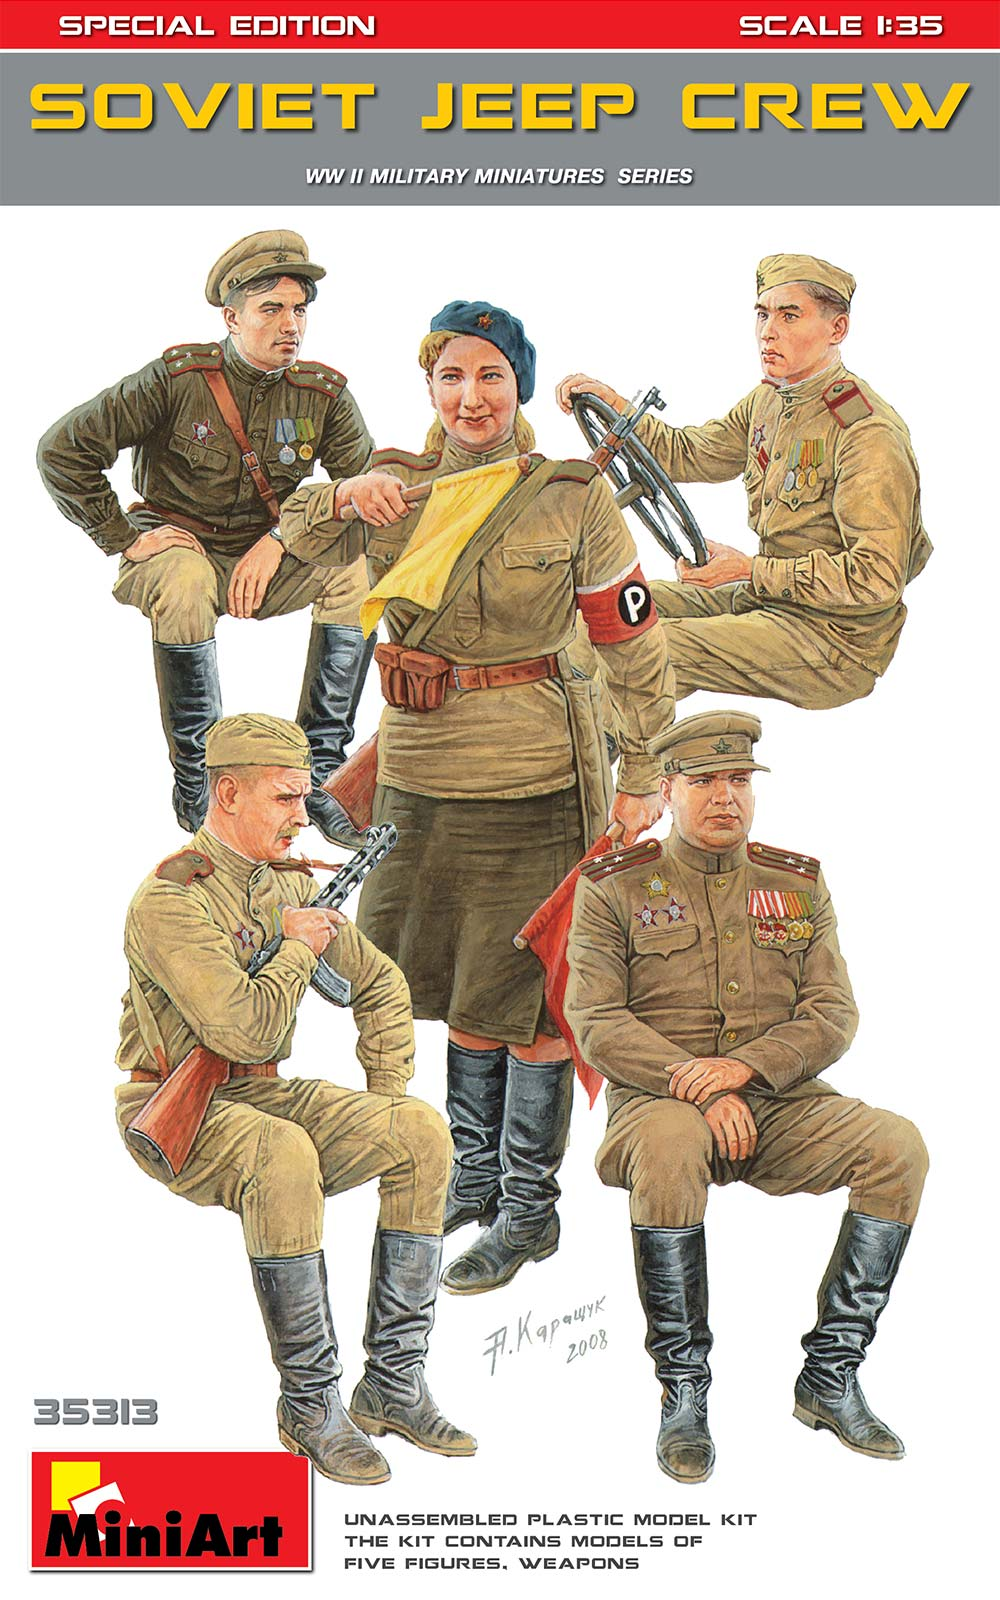 1/35 SOVIET JEEP CREW. SPECIAL EDITION 35313